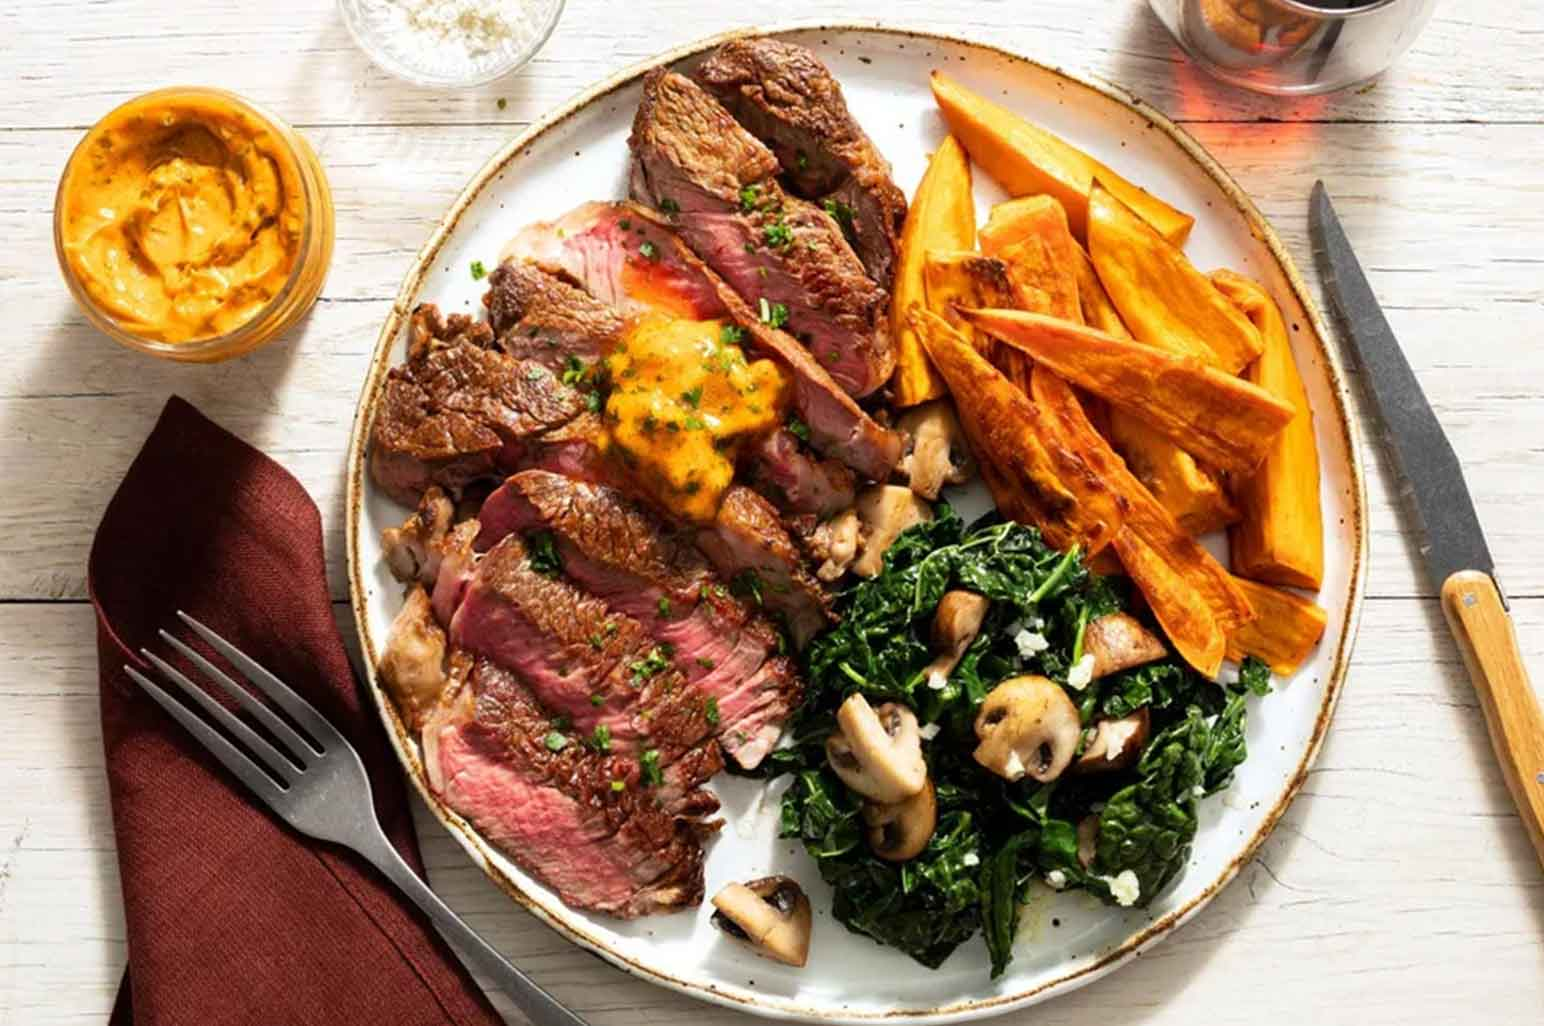 Black Angus Rib-Eye Steaks With Sweet Potato Frites, Kale & Mushrooms Recipe